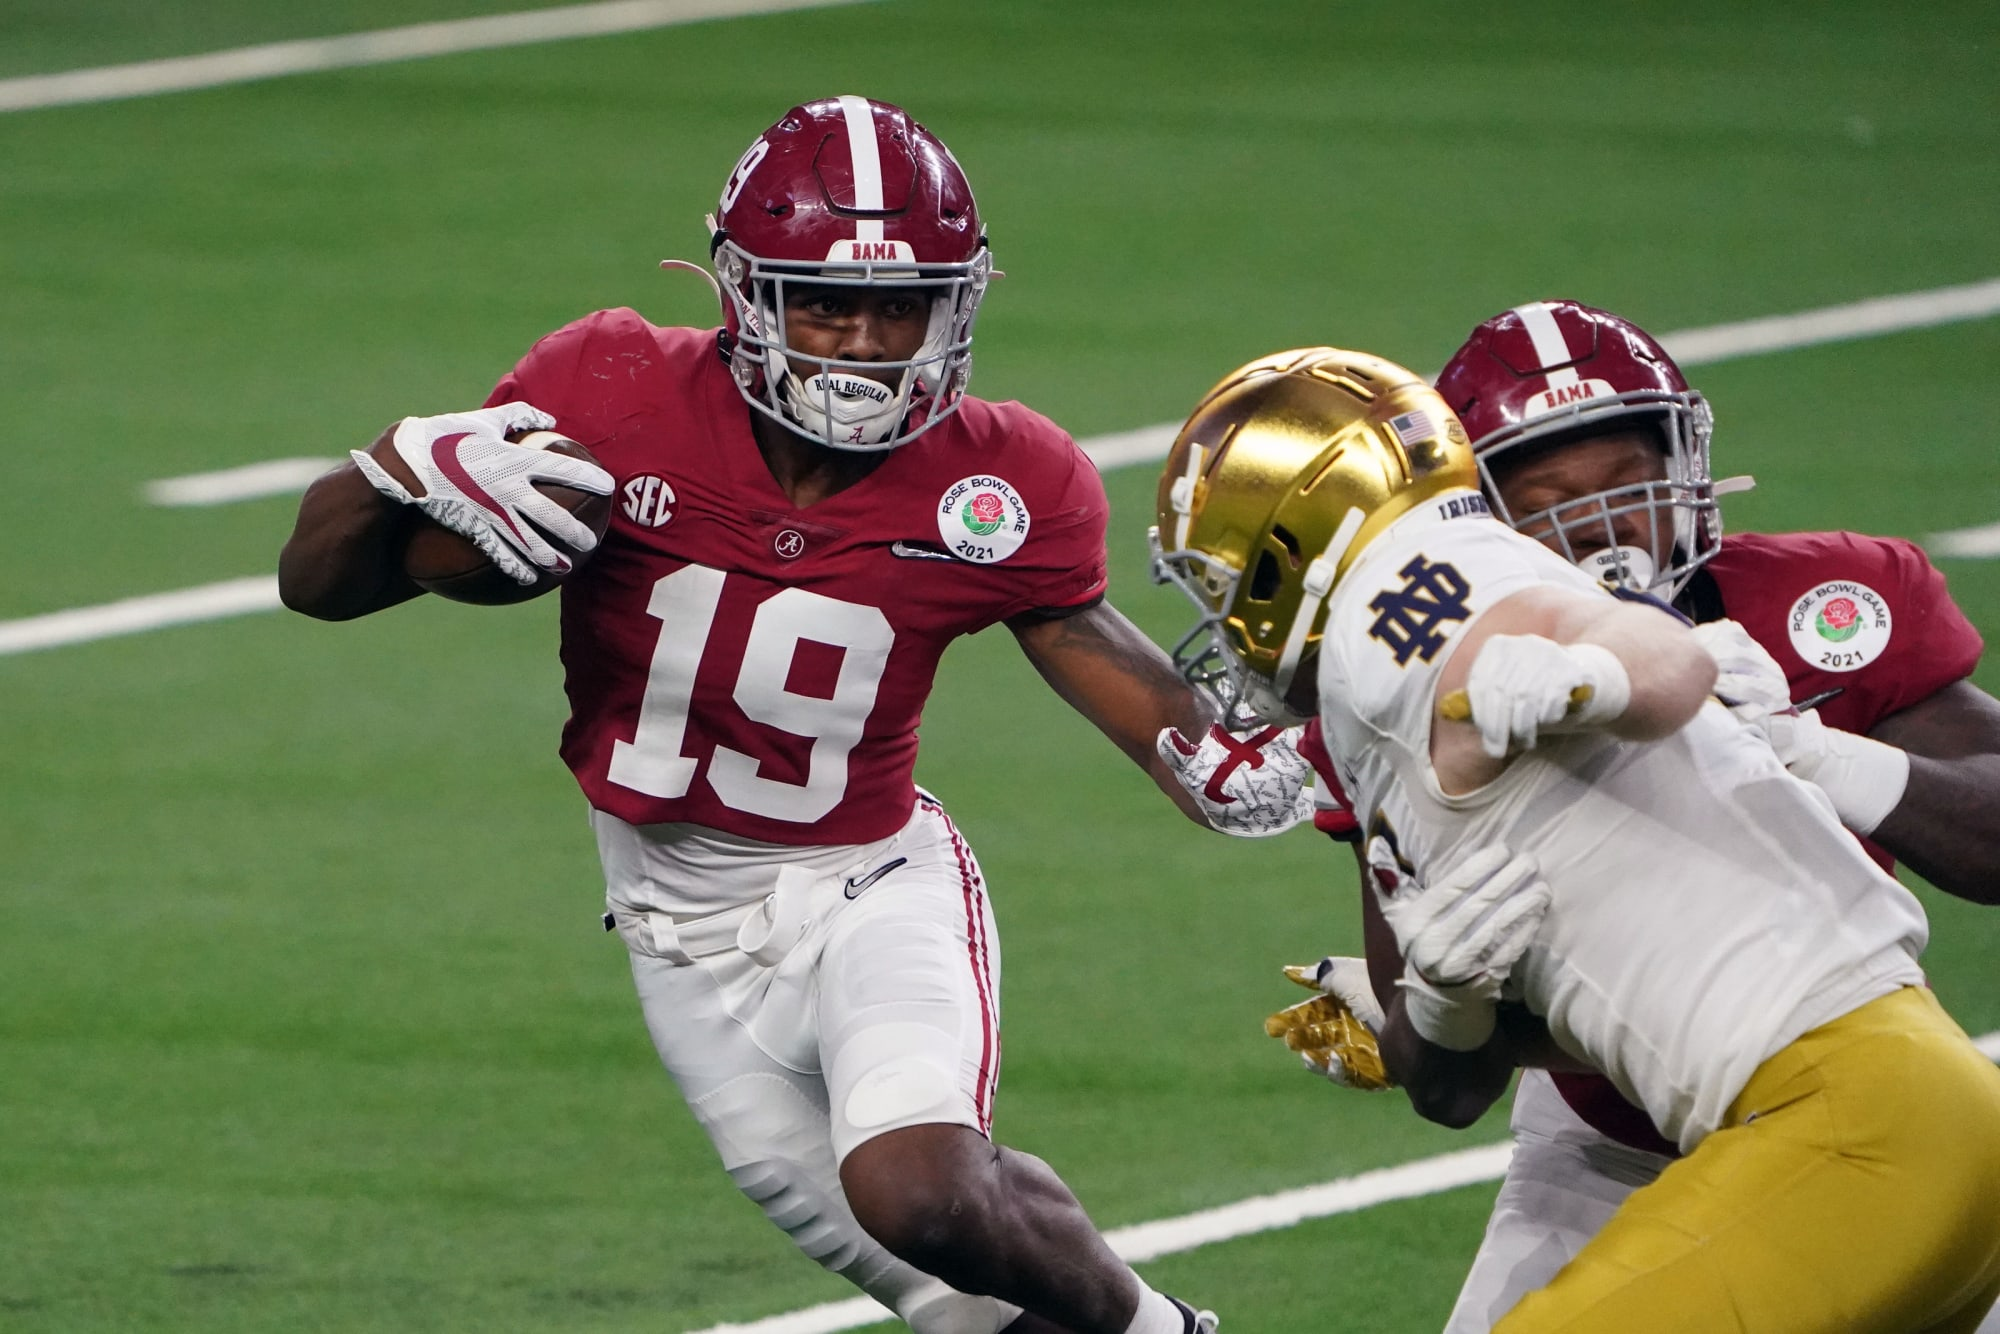 Alabama football: What's the latest on Jahleel Billingsley? - FanSided